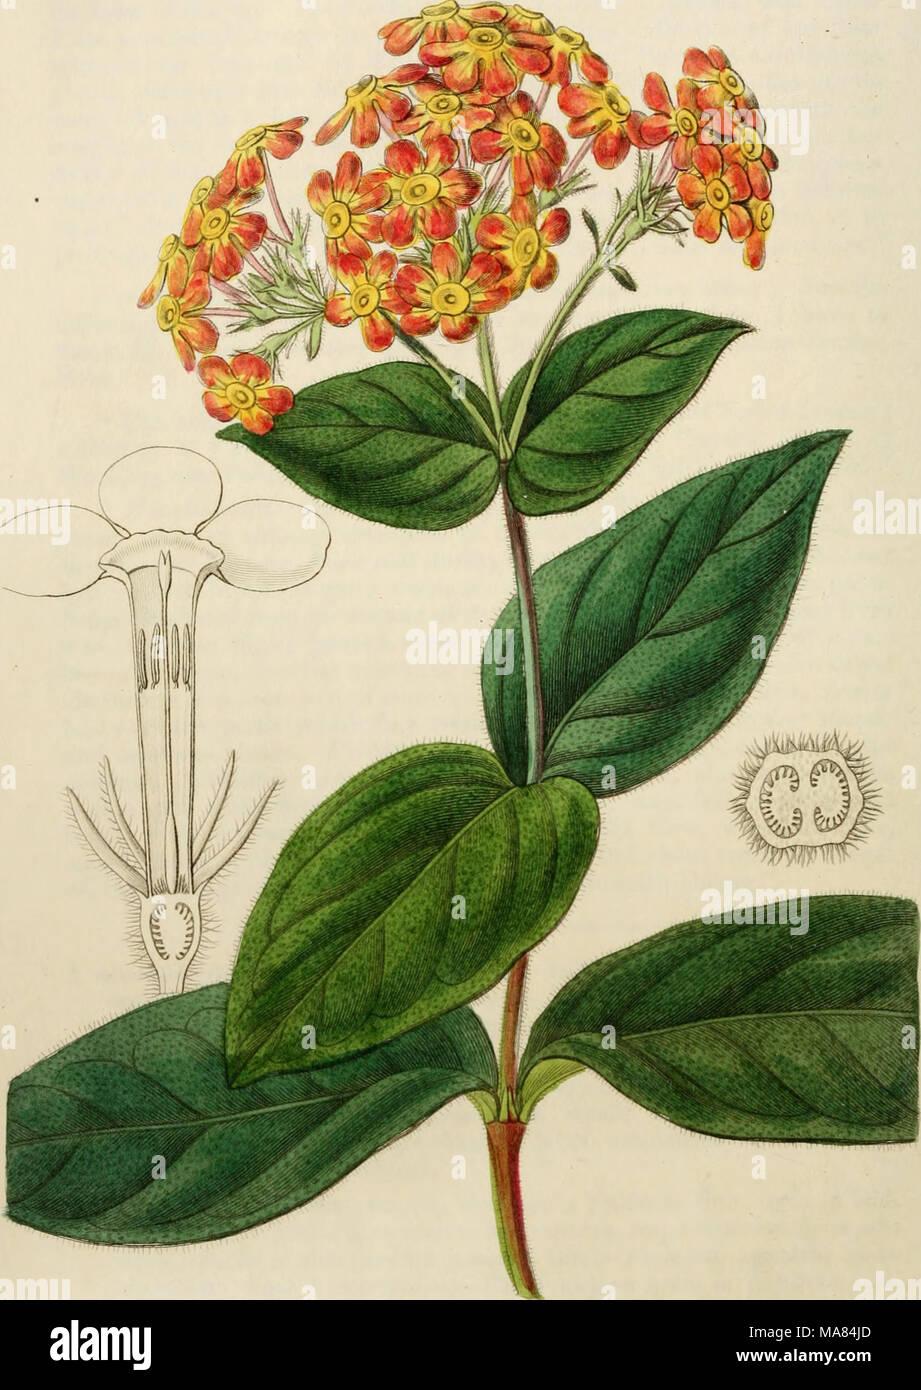 . Edwards' botanical register, or, Ornamental flower-garden and shrubbery .. . jKcjra^toA^, .i4^. ,'V..,,,..,, f^a ^icaiML y/-«-^ /. ^'^'-''6. ^ ^^i^iid/. ^. - Stock Image